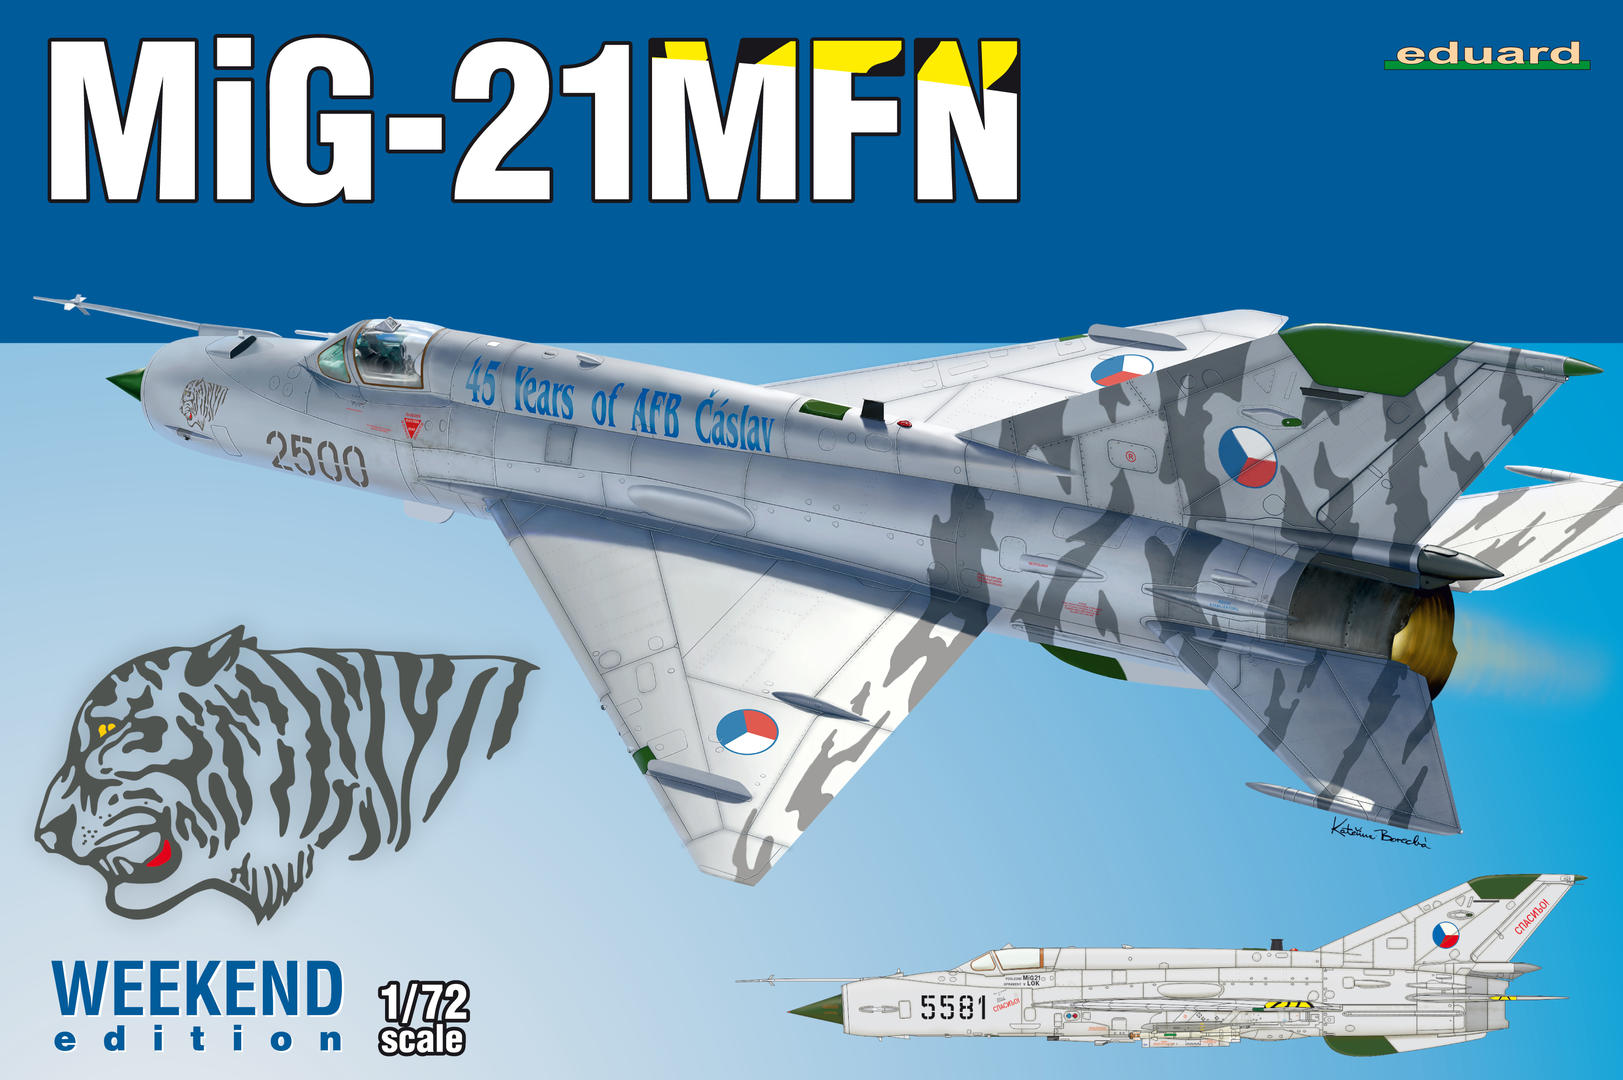 MiG-21PF 3907455 Eduard Plastic Kits Weekend Edition in 1:72